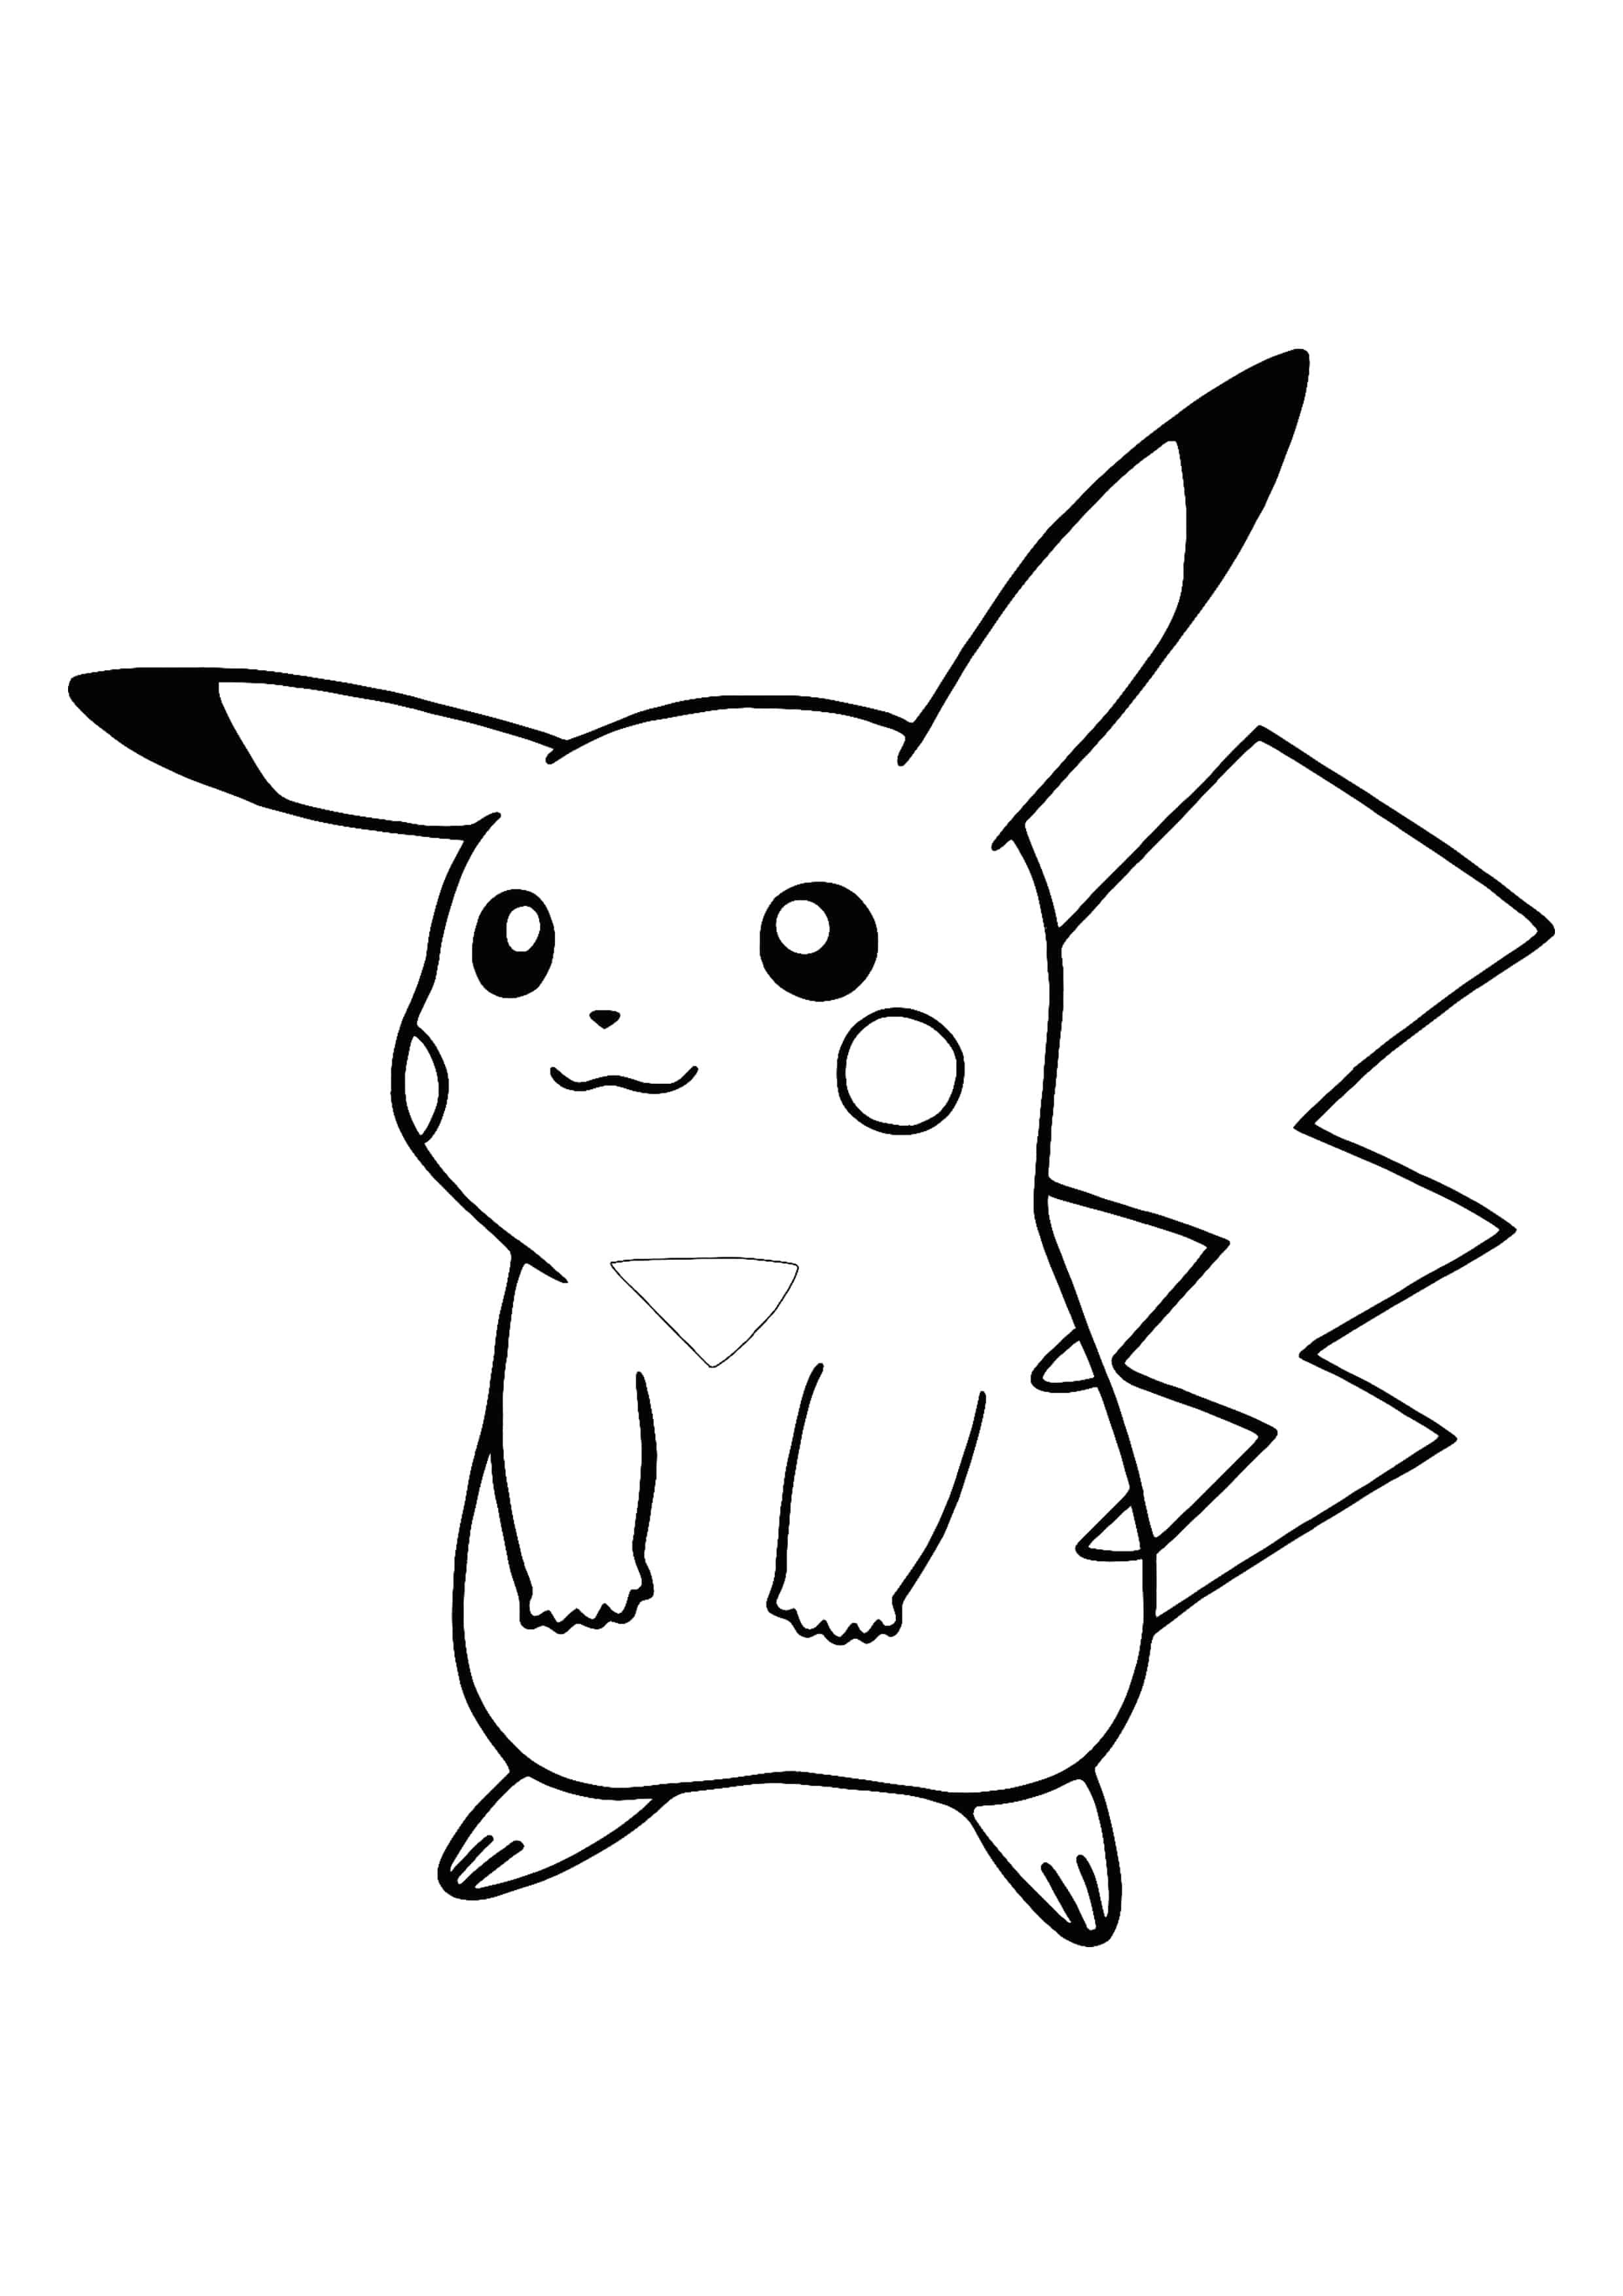 Kawaii Pikachu Coloring Page Pokemon Coloring Pages Pokemon Coloring Pikachu Coloring Page